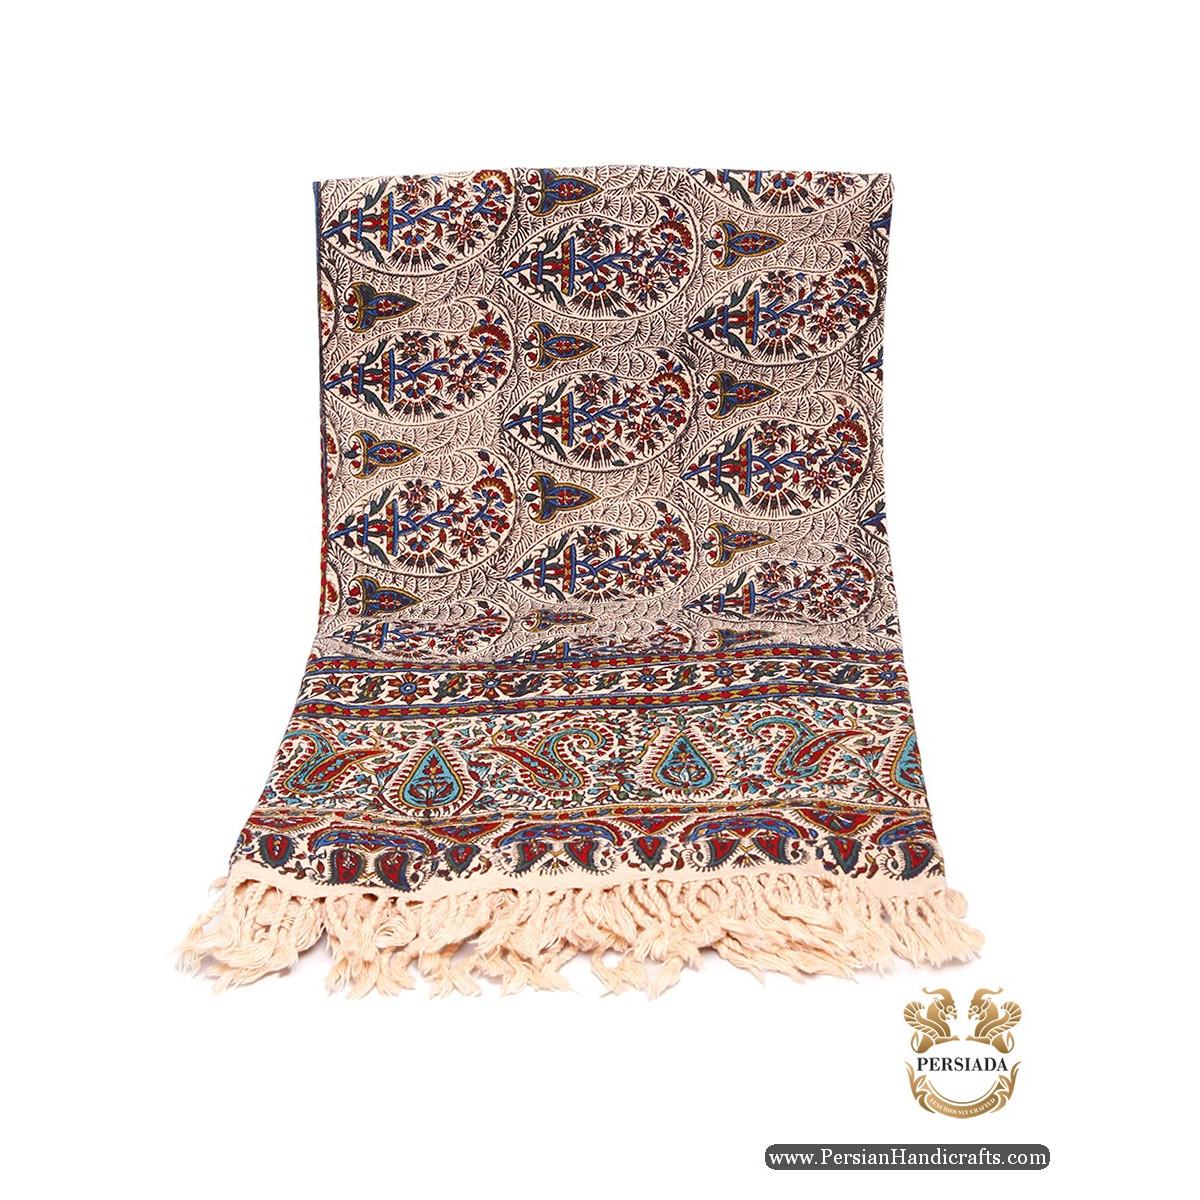 Square Tablecloth | Hand Printed Ghalamkar | Persiada HGH6110